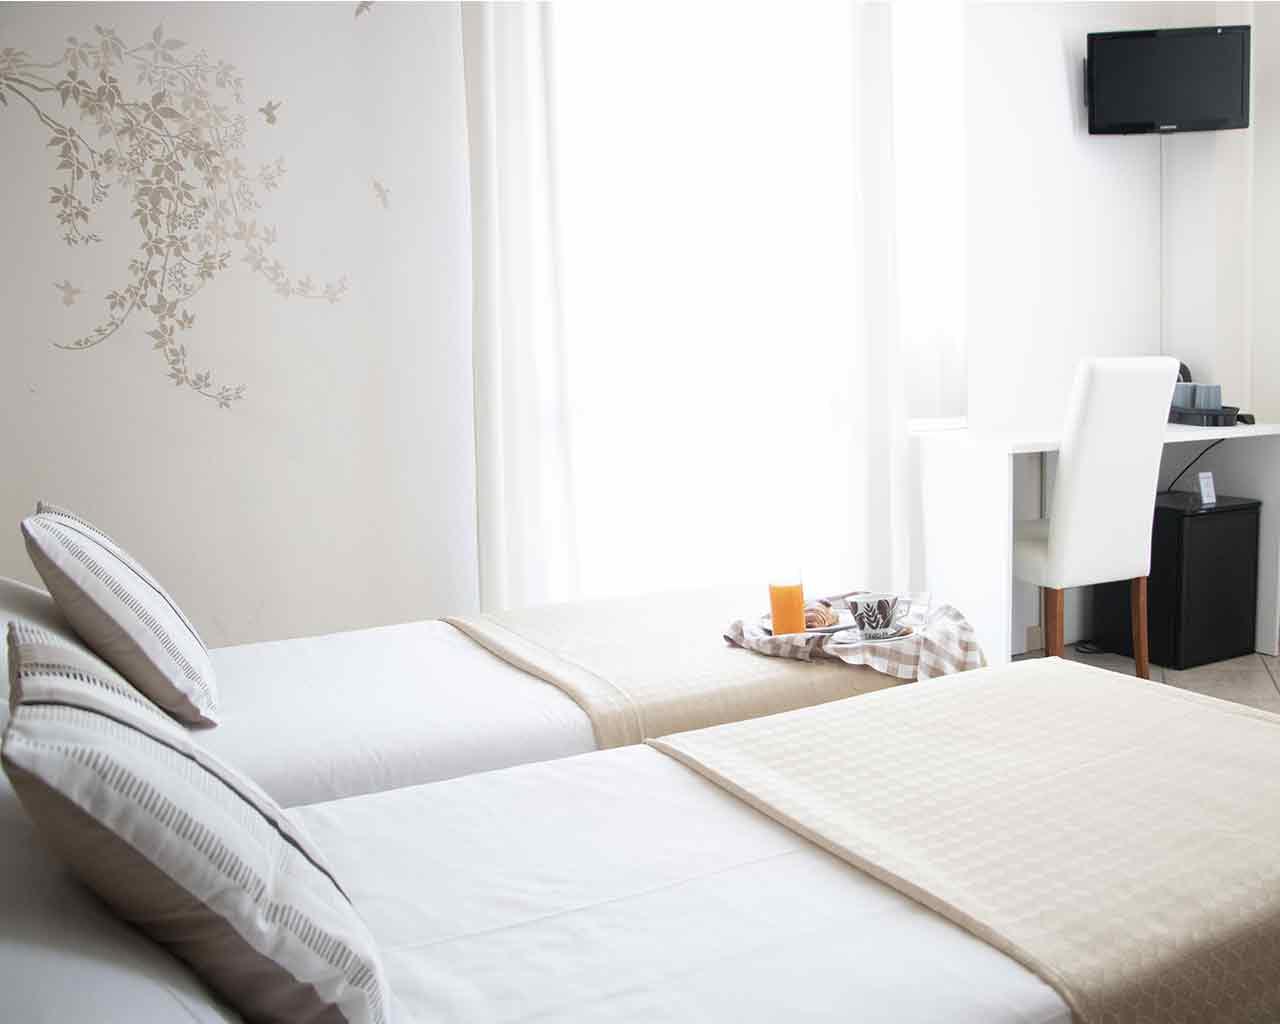 Hotel Emi camera doppia